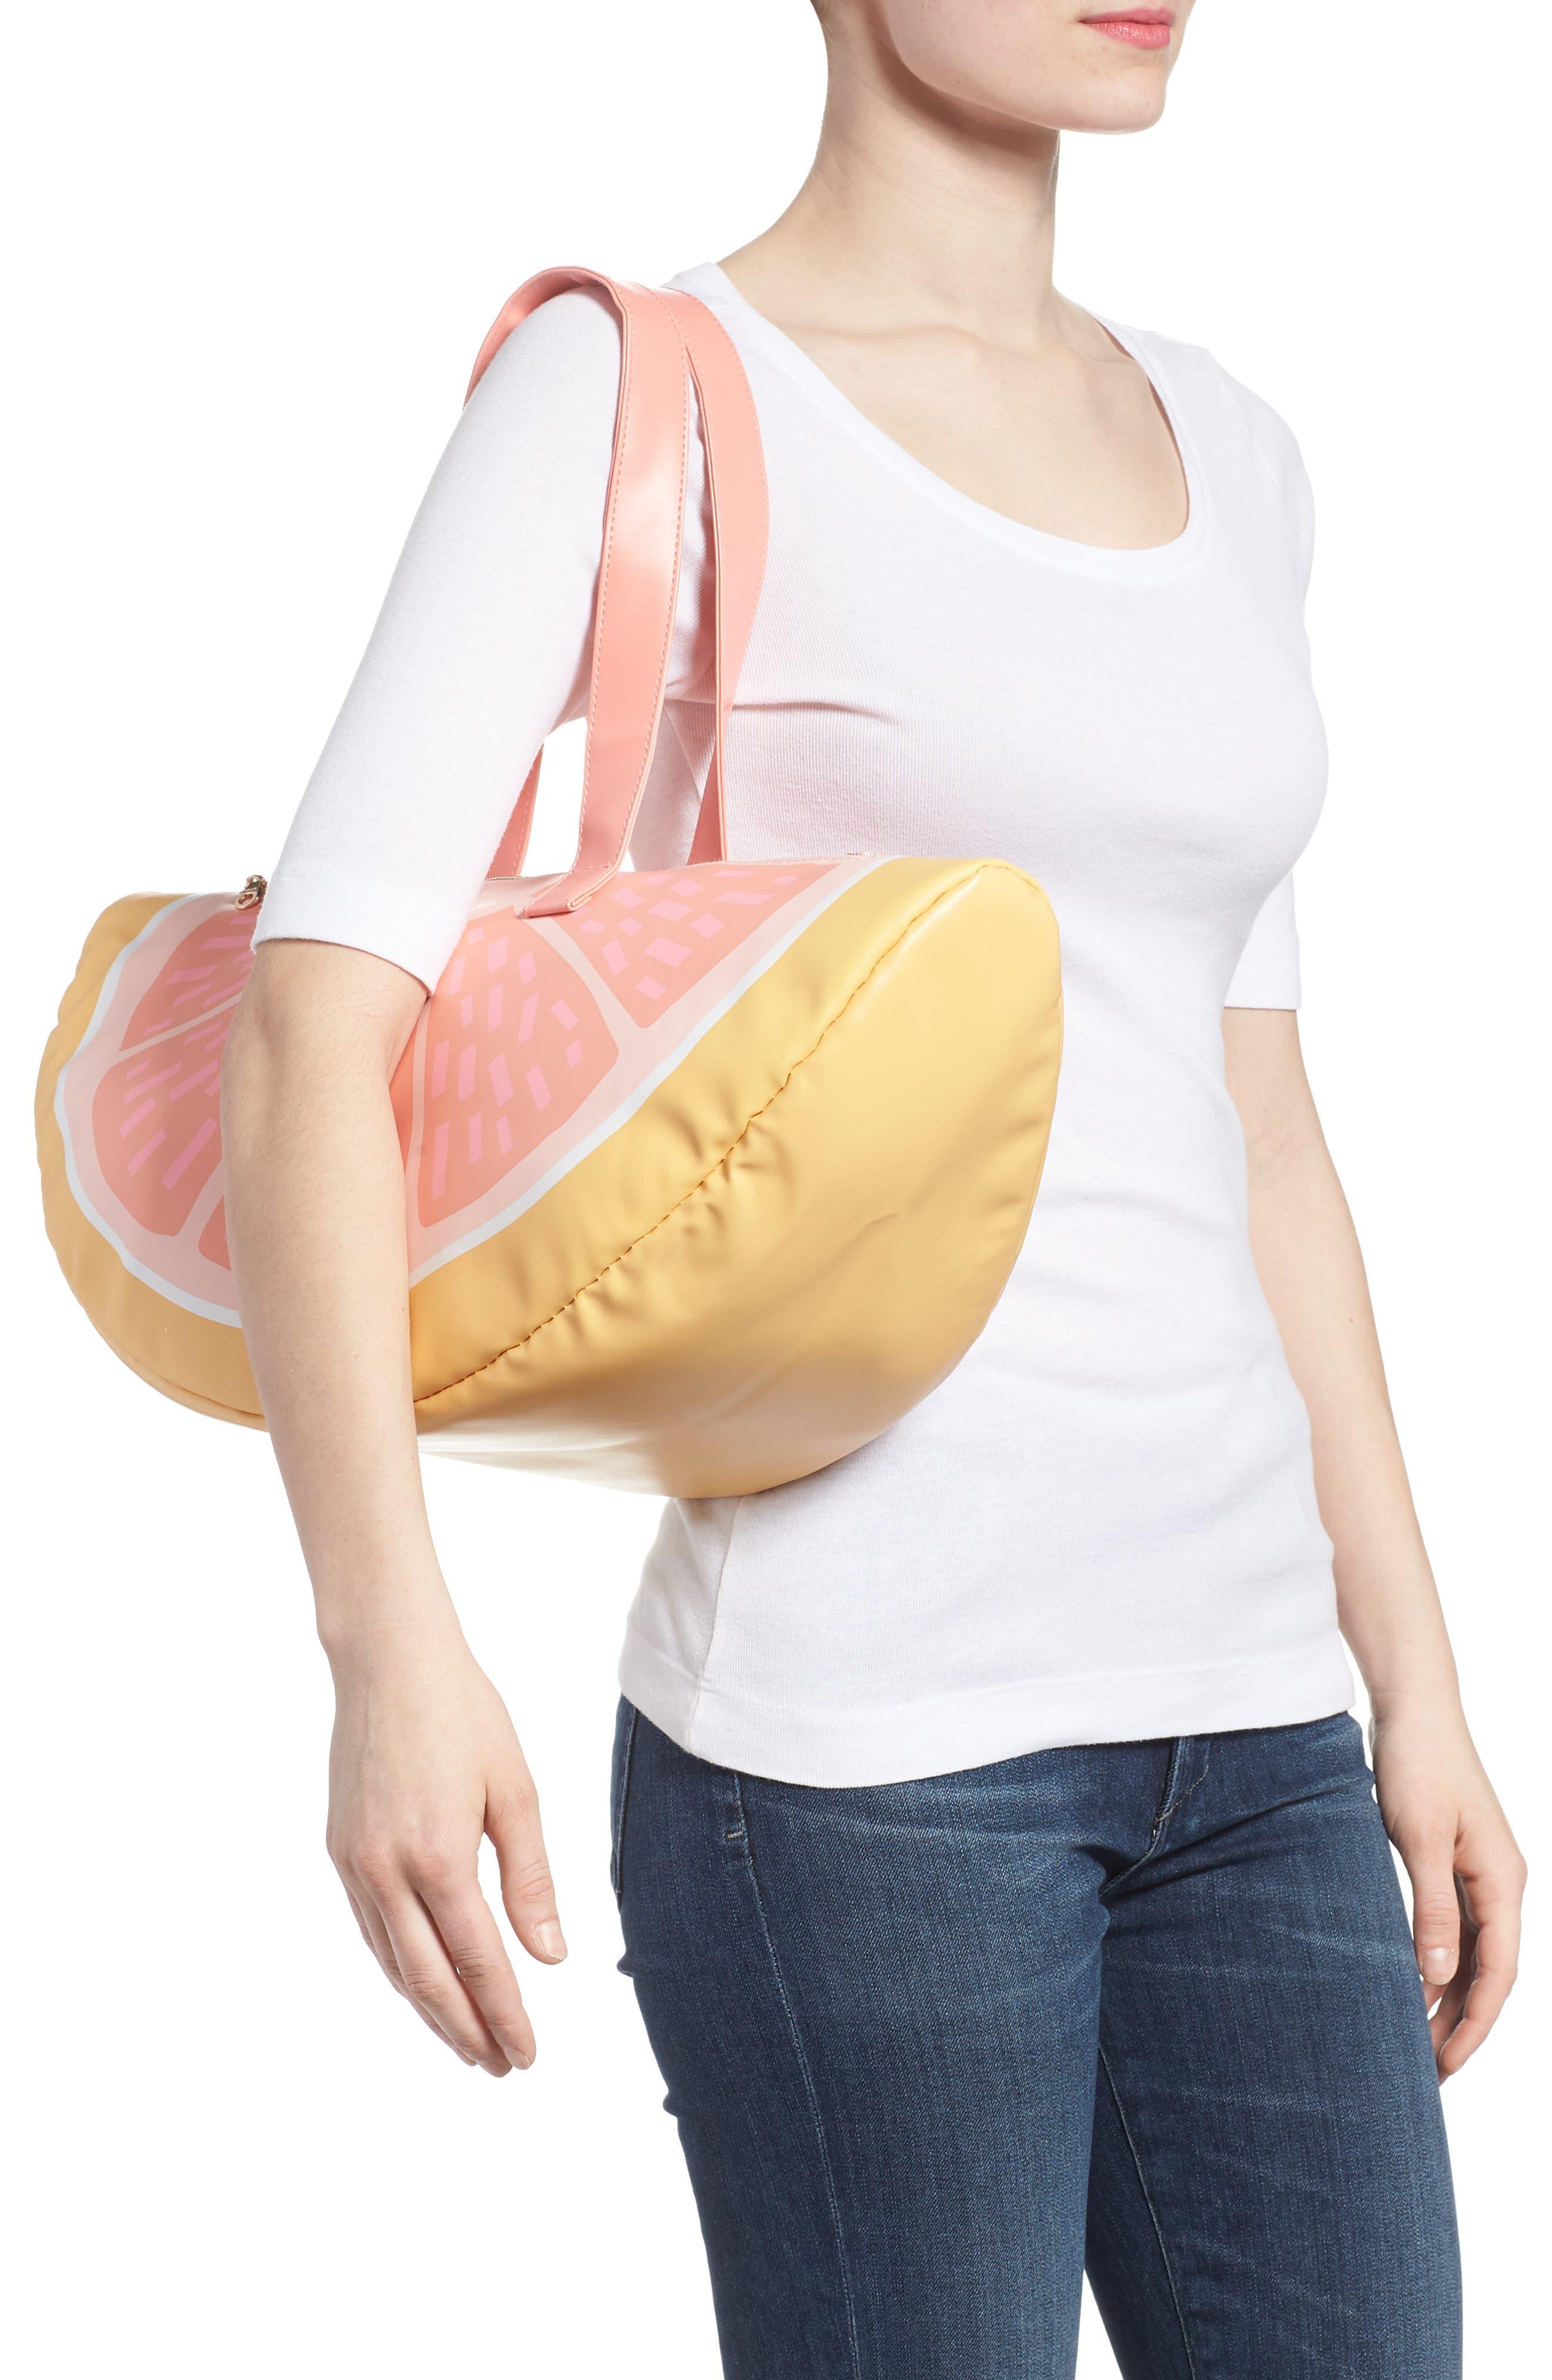 Grapefruit Cooler Bag,                             Alternate thumbnail 2, color,                             Coral